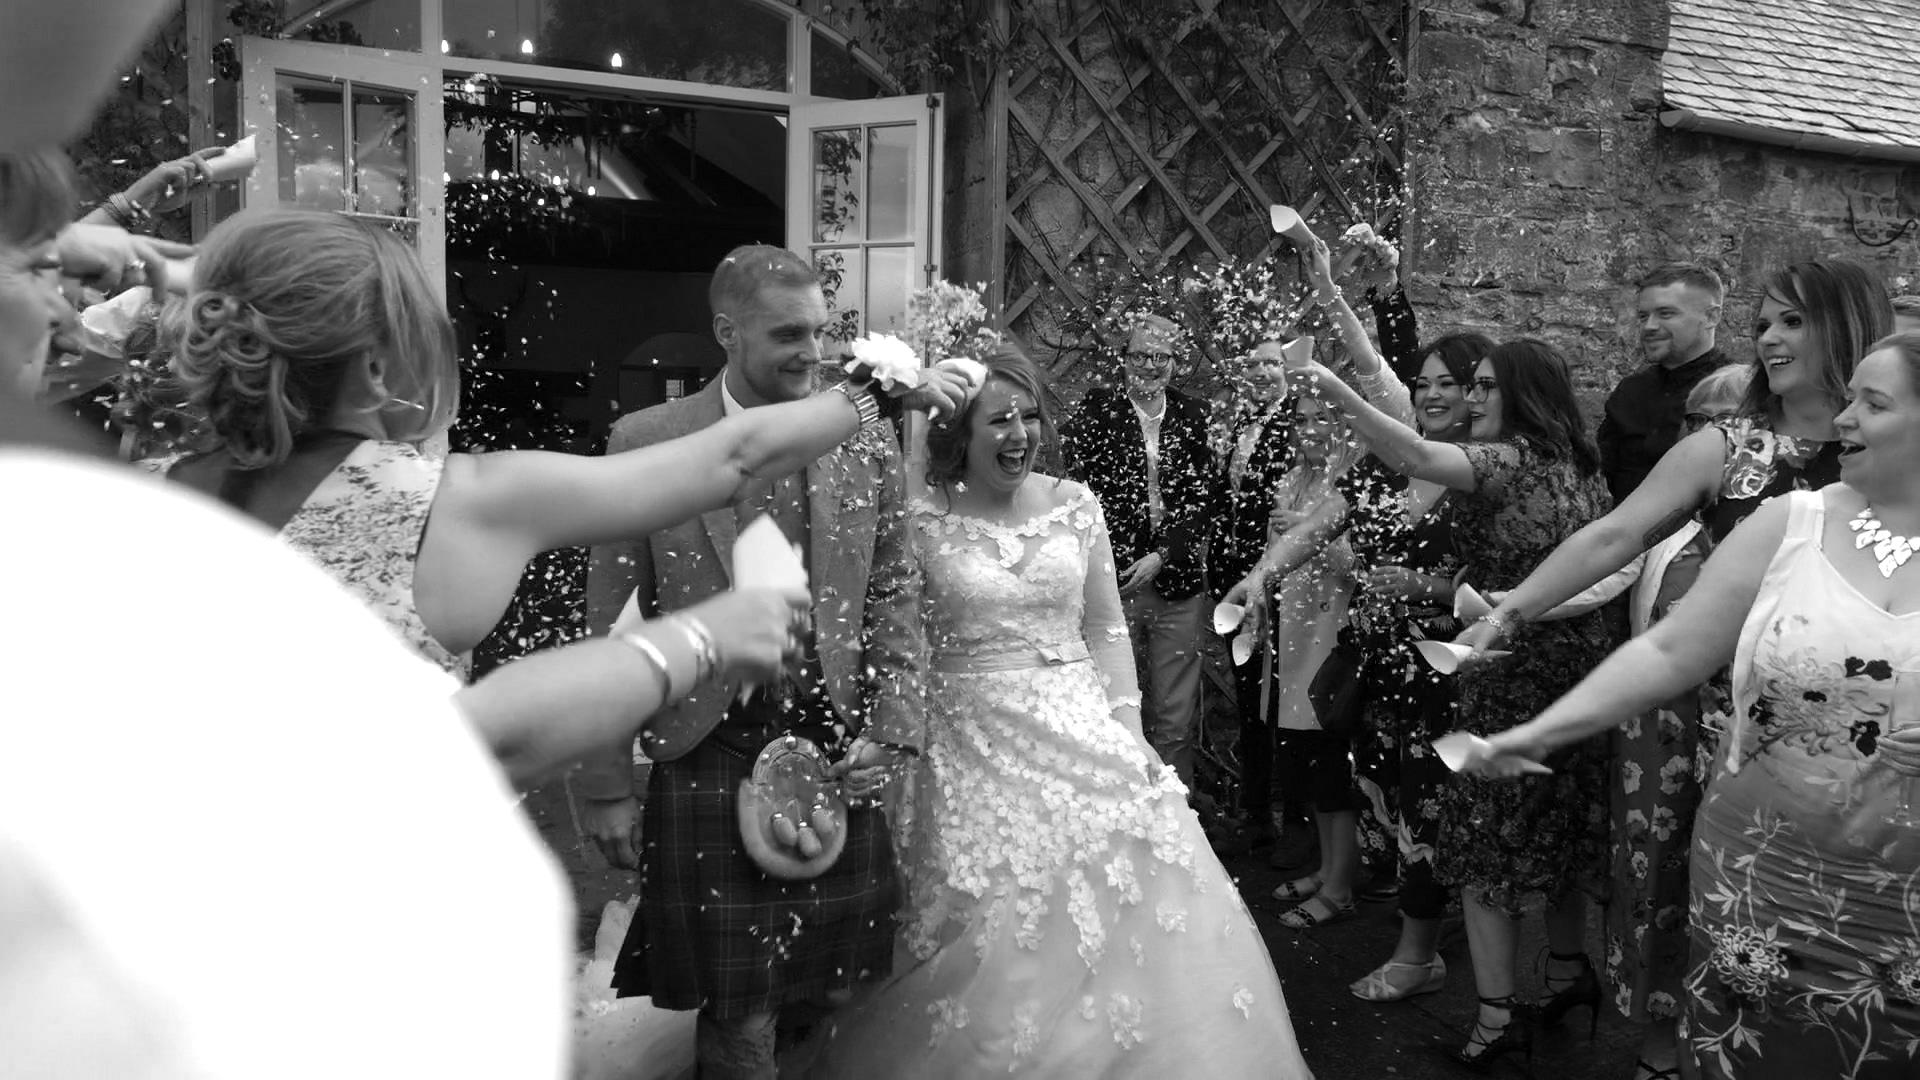 ASWANLEY-SUMMER-WEDDING (19).jpg